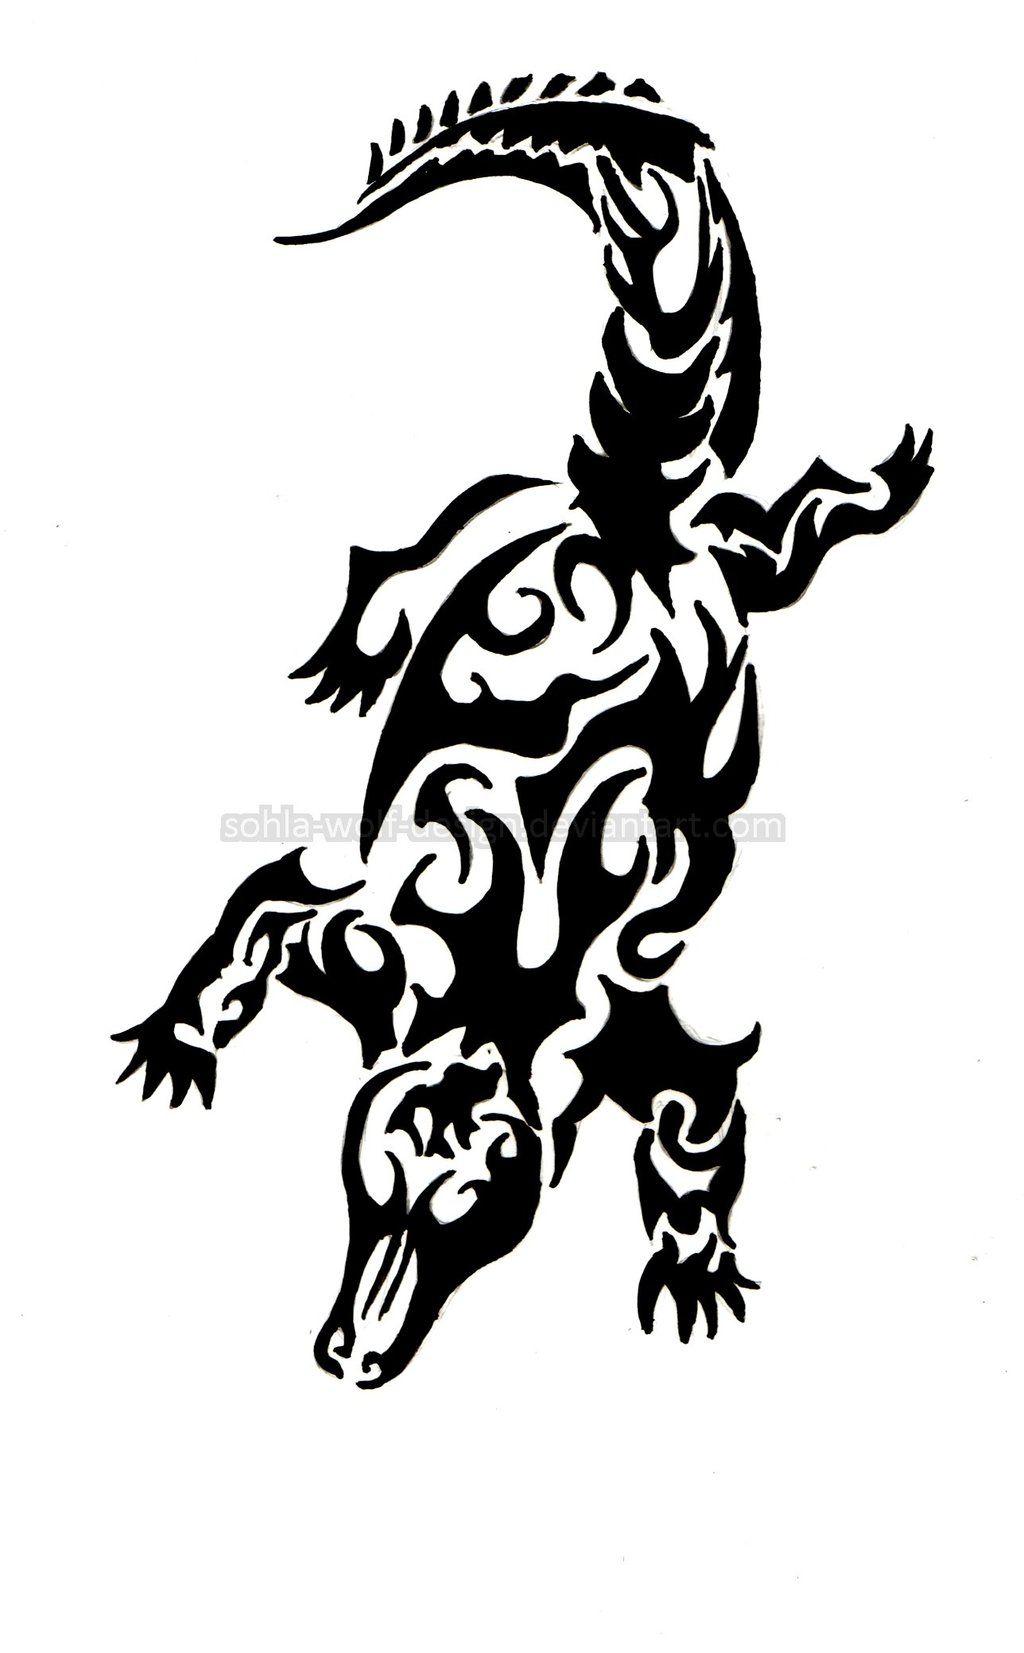 f6b5be5105d78 Alligator Tattoo, Weird Tattoos, Tribal Tattoos, Maori, Tatoo Designs,  Pyrography Ideas, Crocodile, Brewery, Vectors